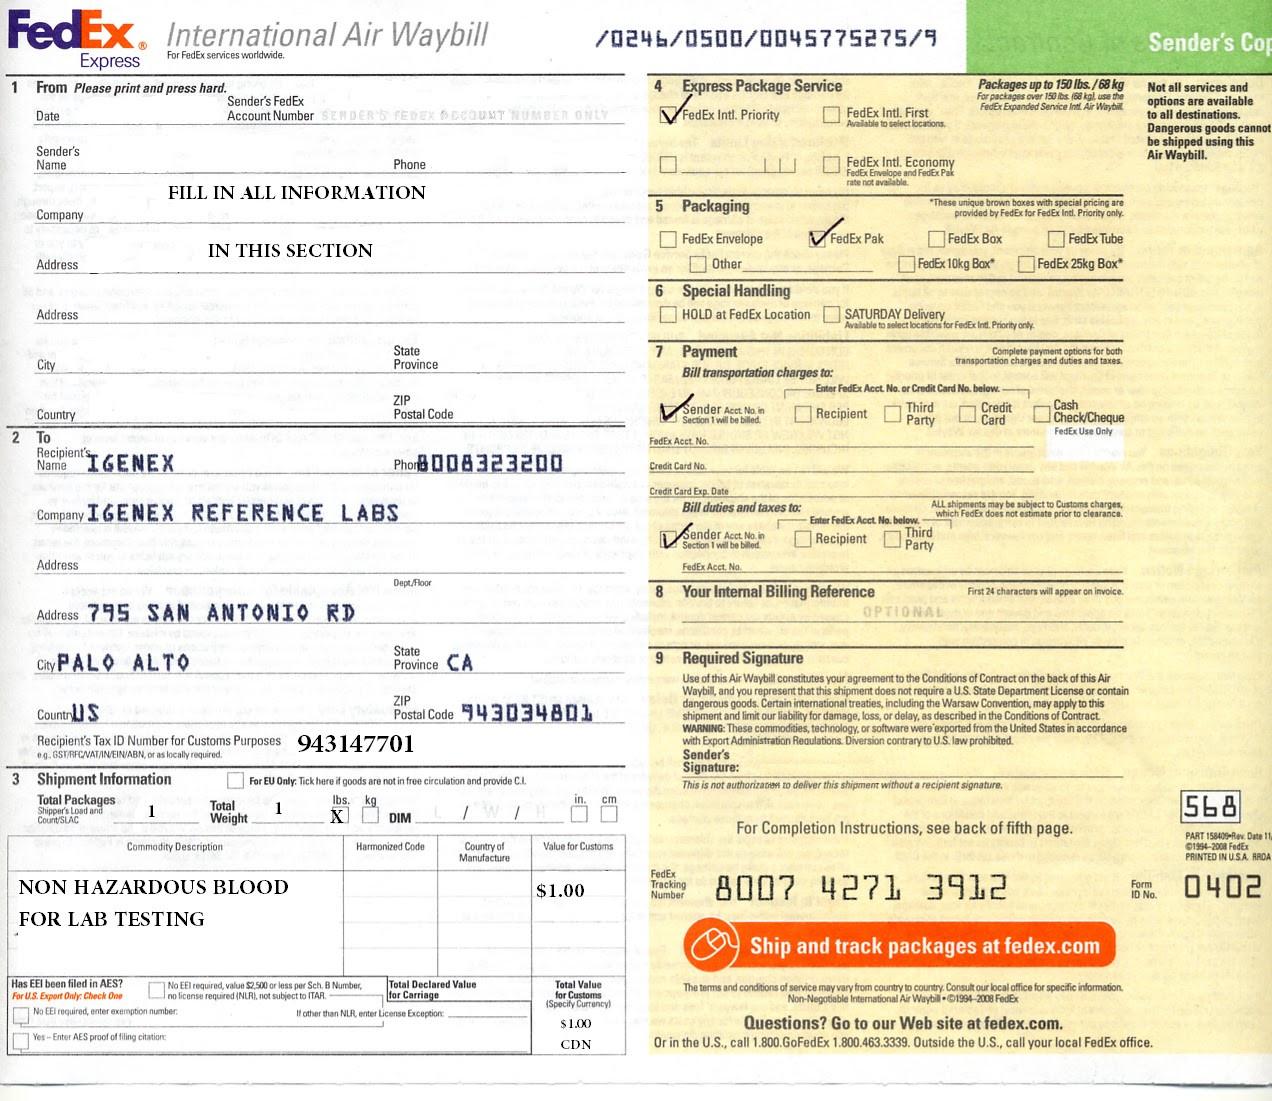 Fedex International Air Waybill Form Download